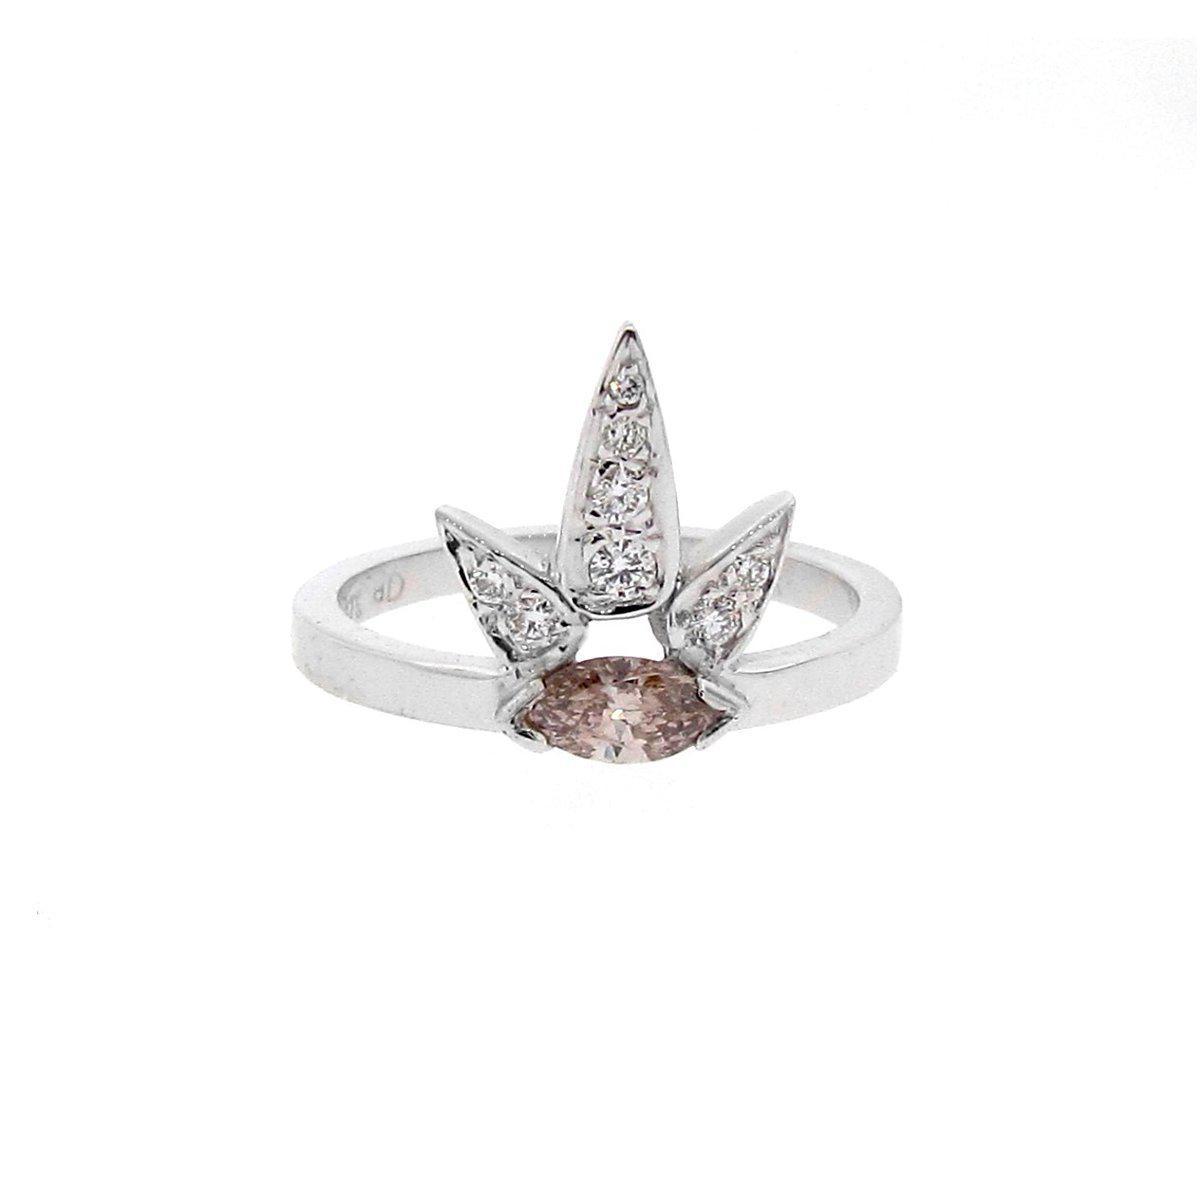 Argenton Design White Gold Diamond Lotus Ring - UK L - US 5 1/2 - EU 51 3/4 lMoKhNij